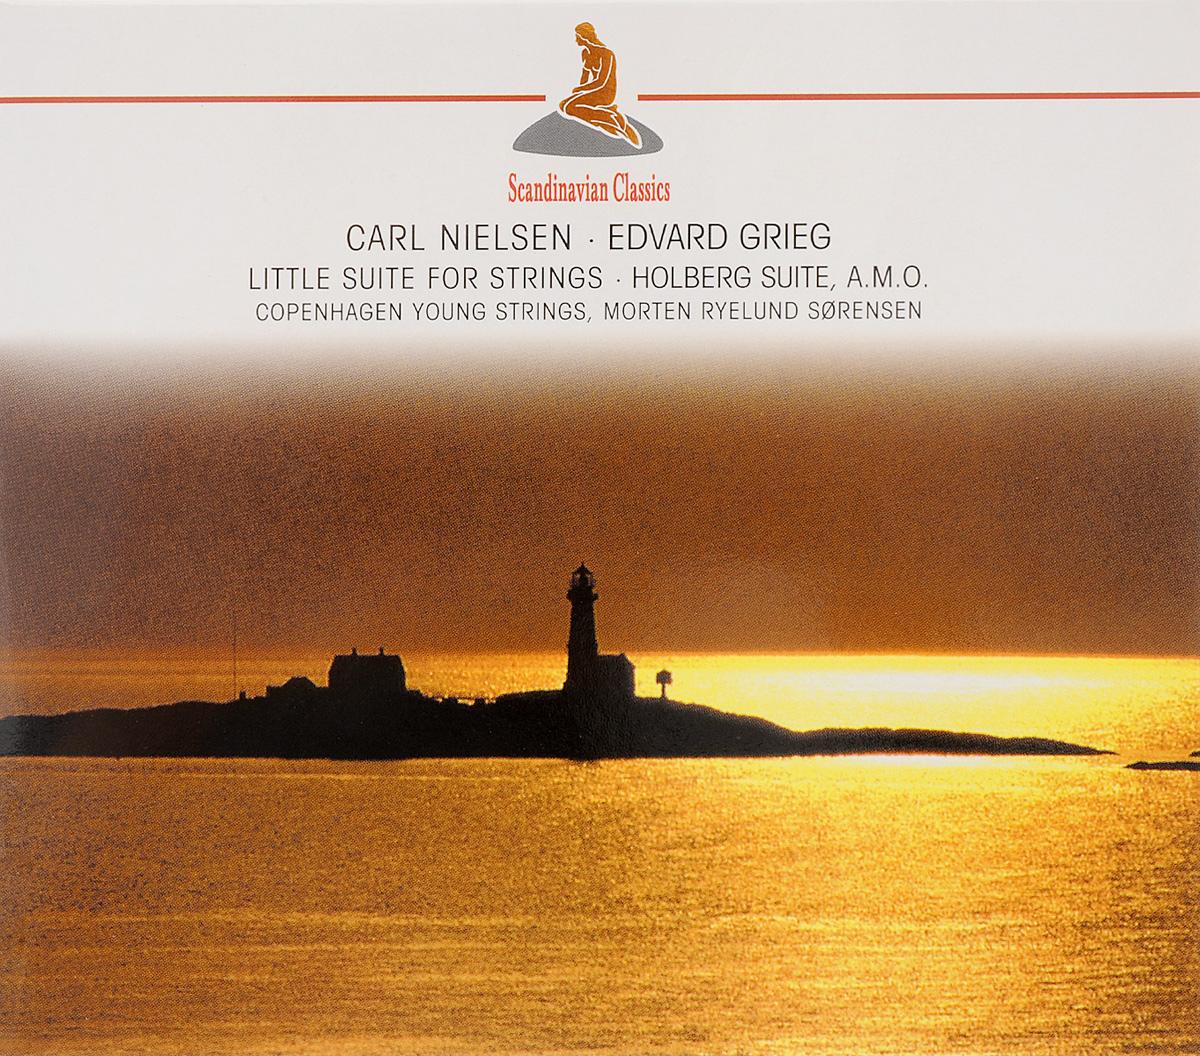 лучшая цена Scandinavian Classics. Carl Nielsen. Little Suite For Strings / Edvard Grieg. From Holberg's Suite, A.M.O (2 CD)